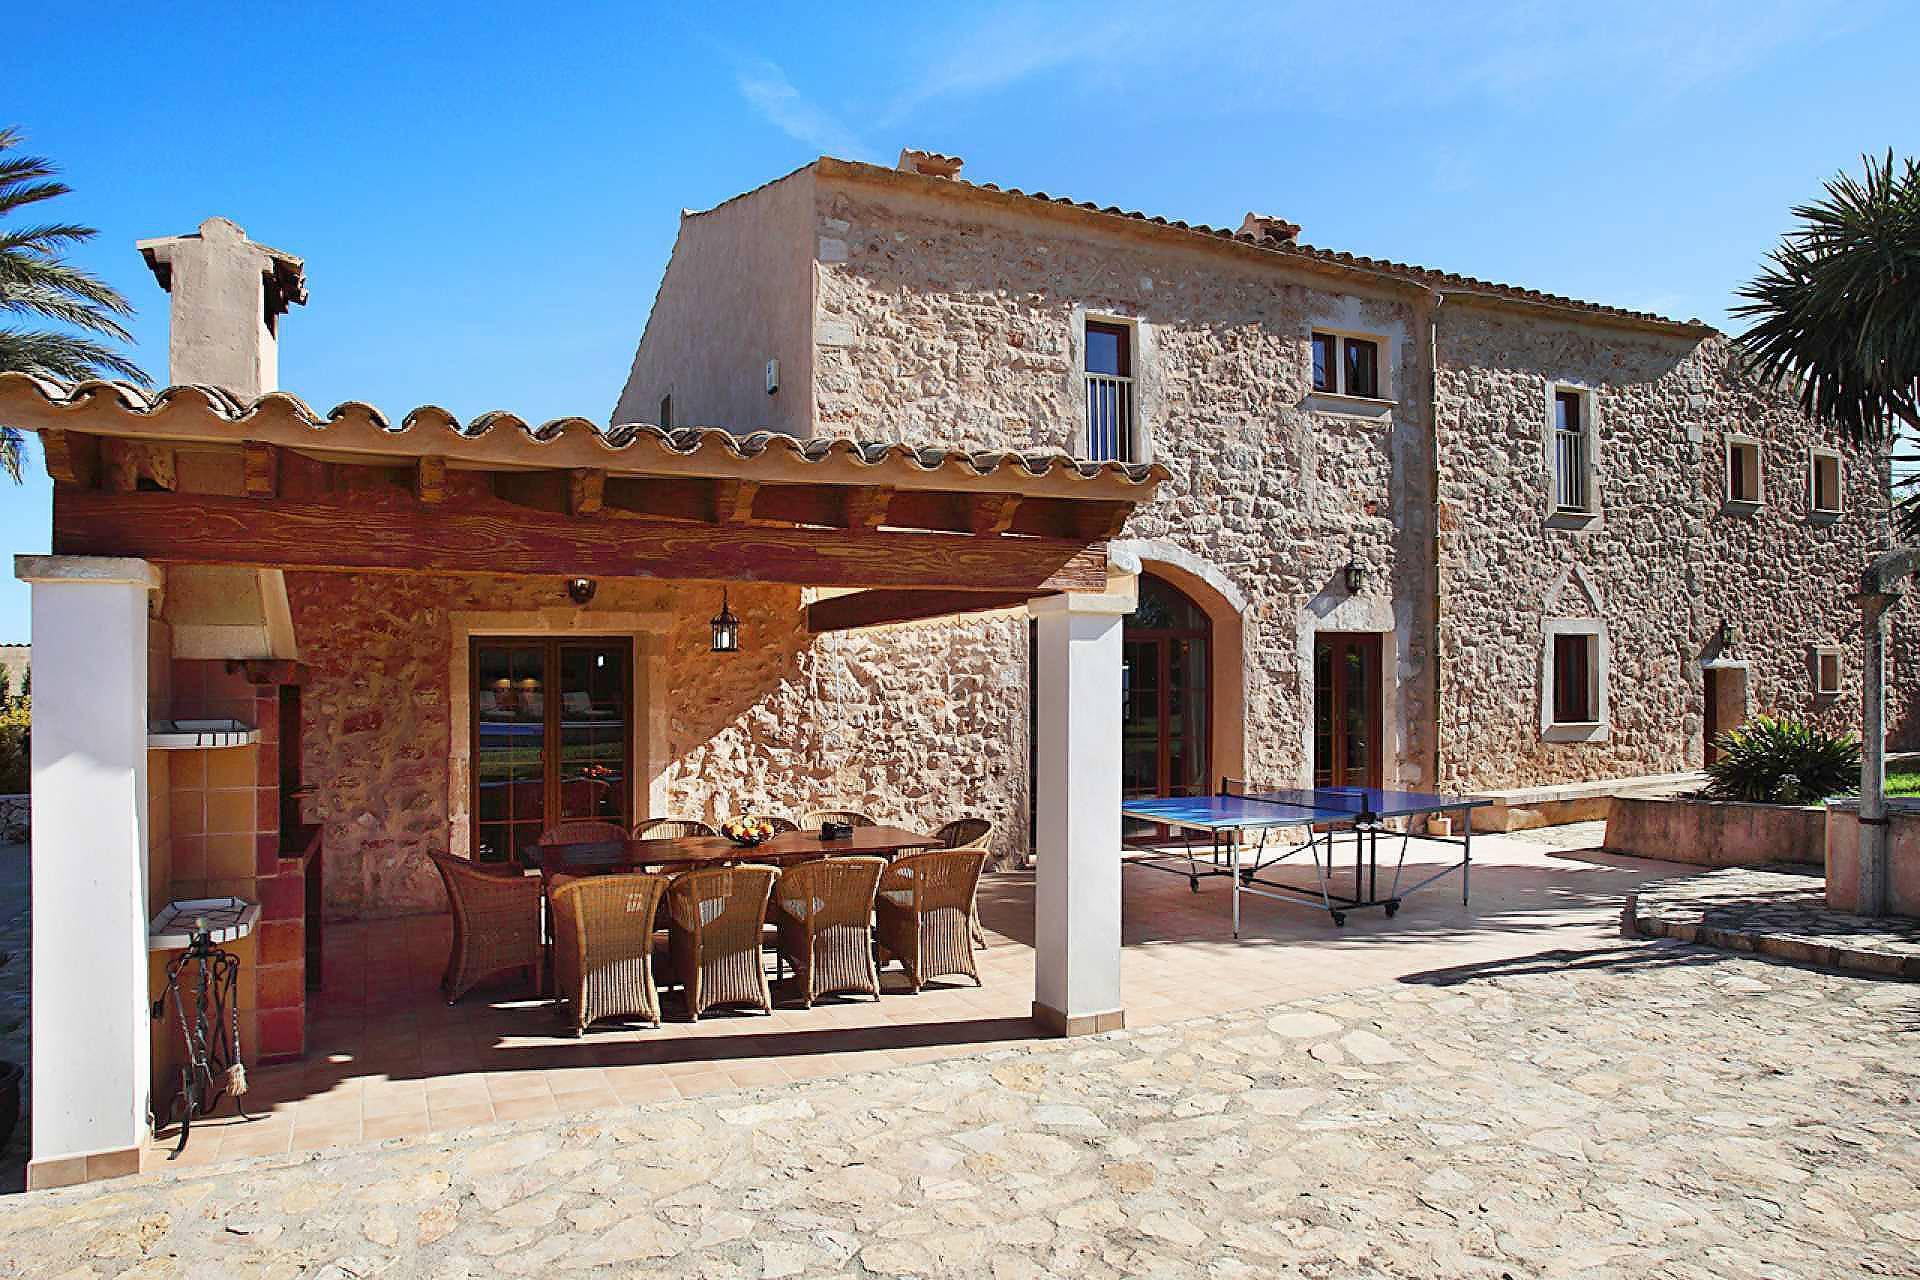 01-33 Großzügiges Ferienhaus Mallorca Osten Bild 35